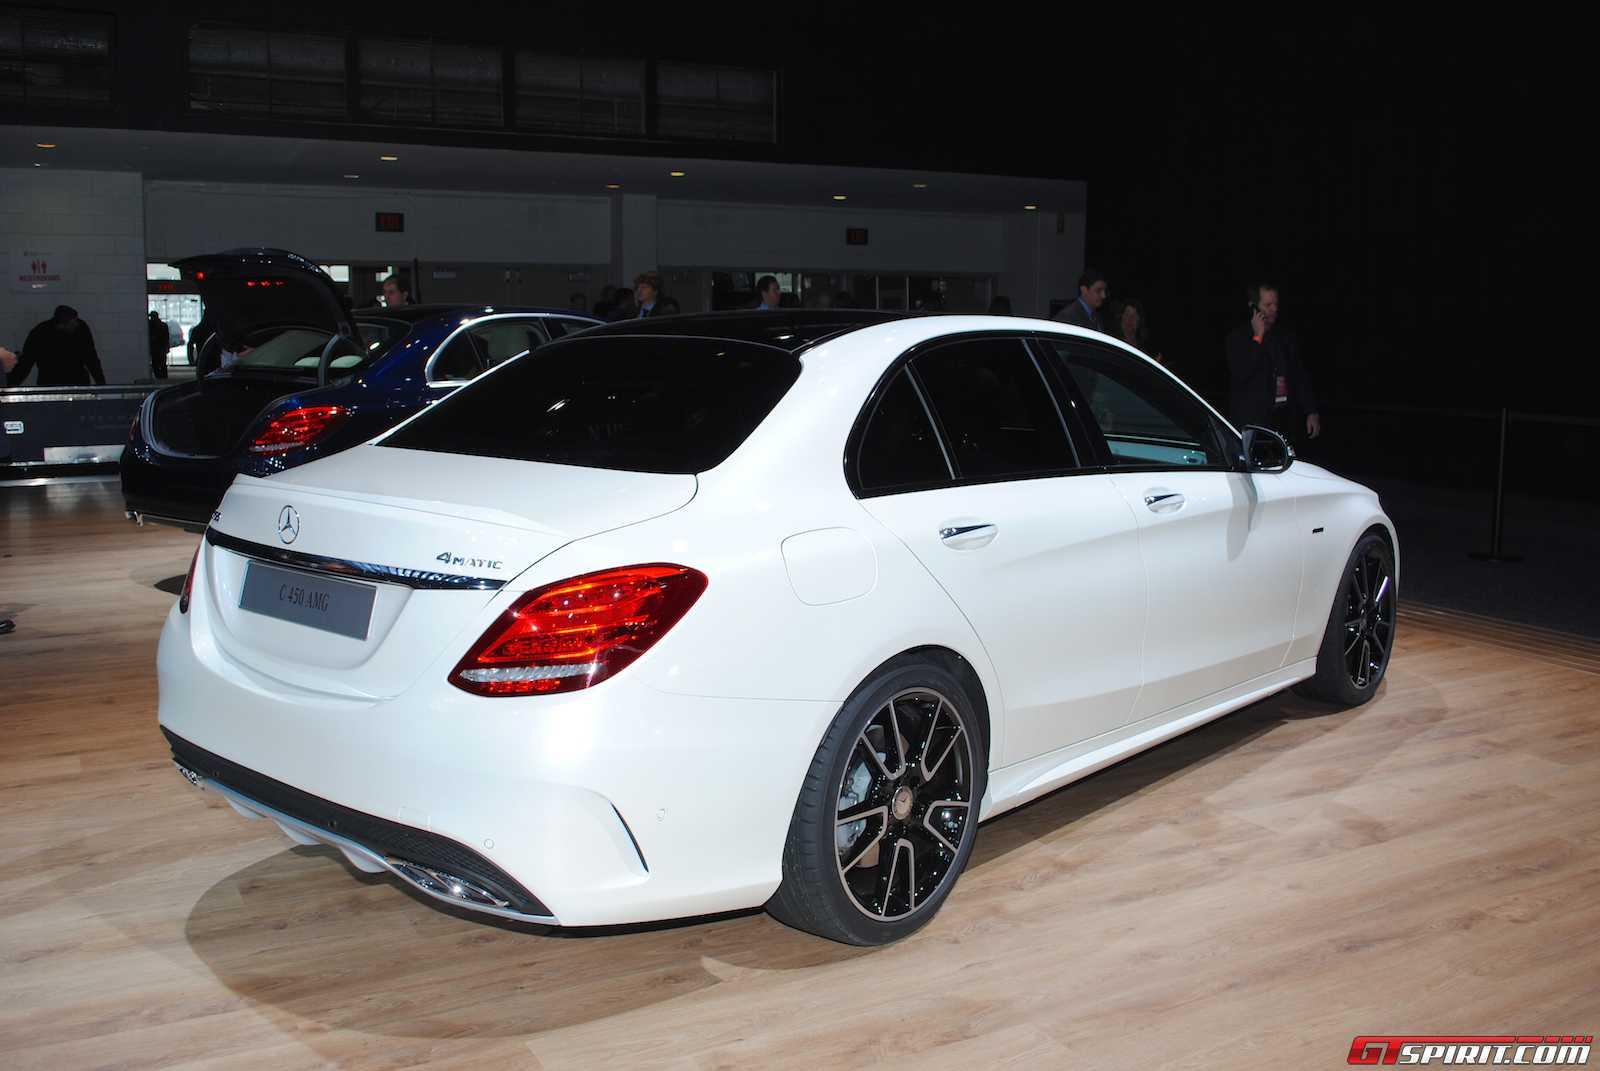 Detroit 2015 Mercedes Benz C450 Amg 4matic Gtspirit